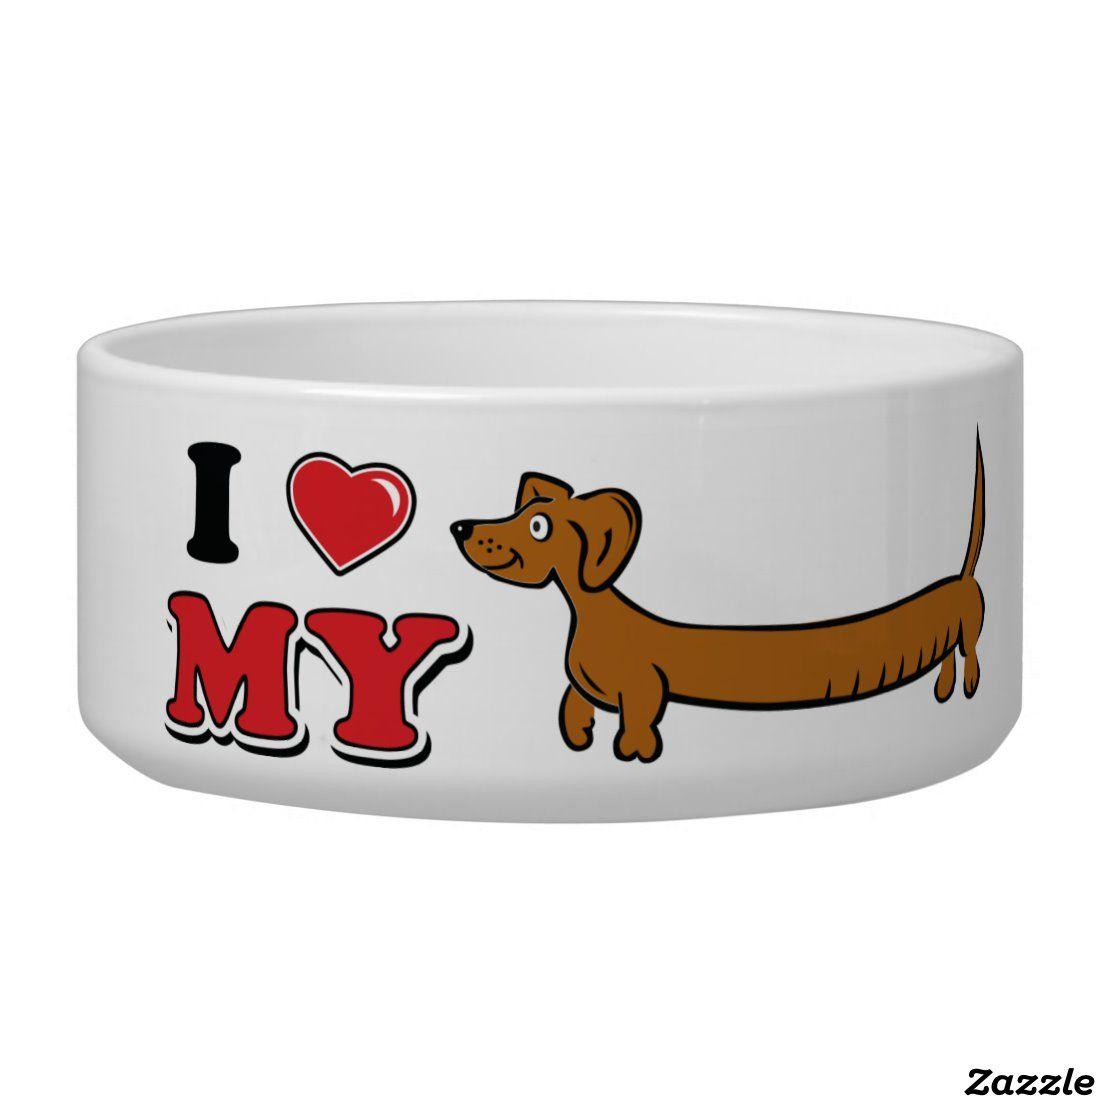 Create Your Own Ceramic Pet Bowl Zazzle Com In 2020 Pet Bowls